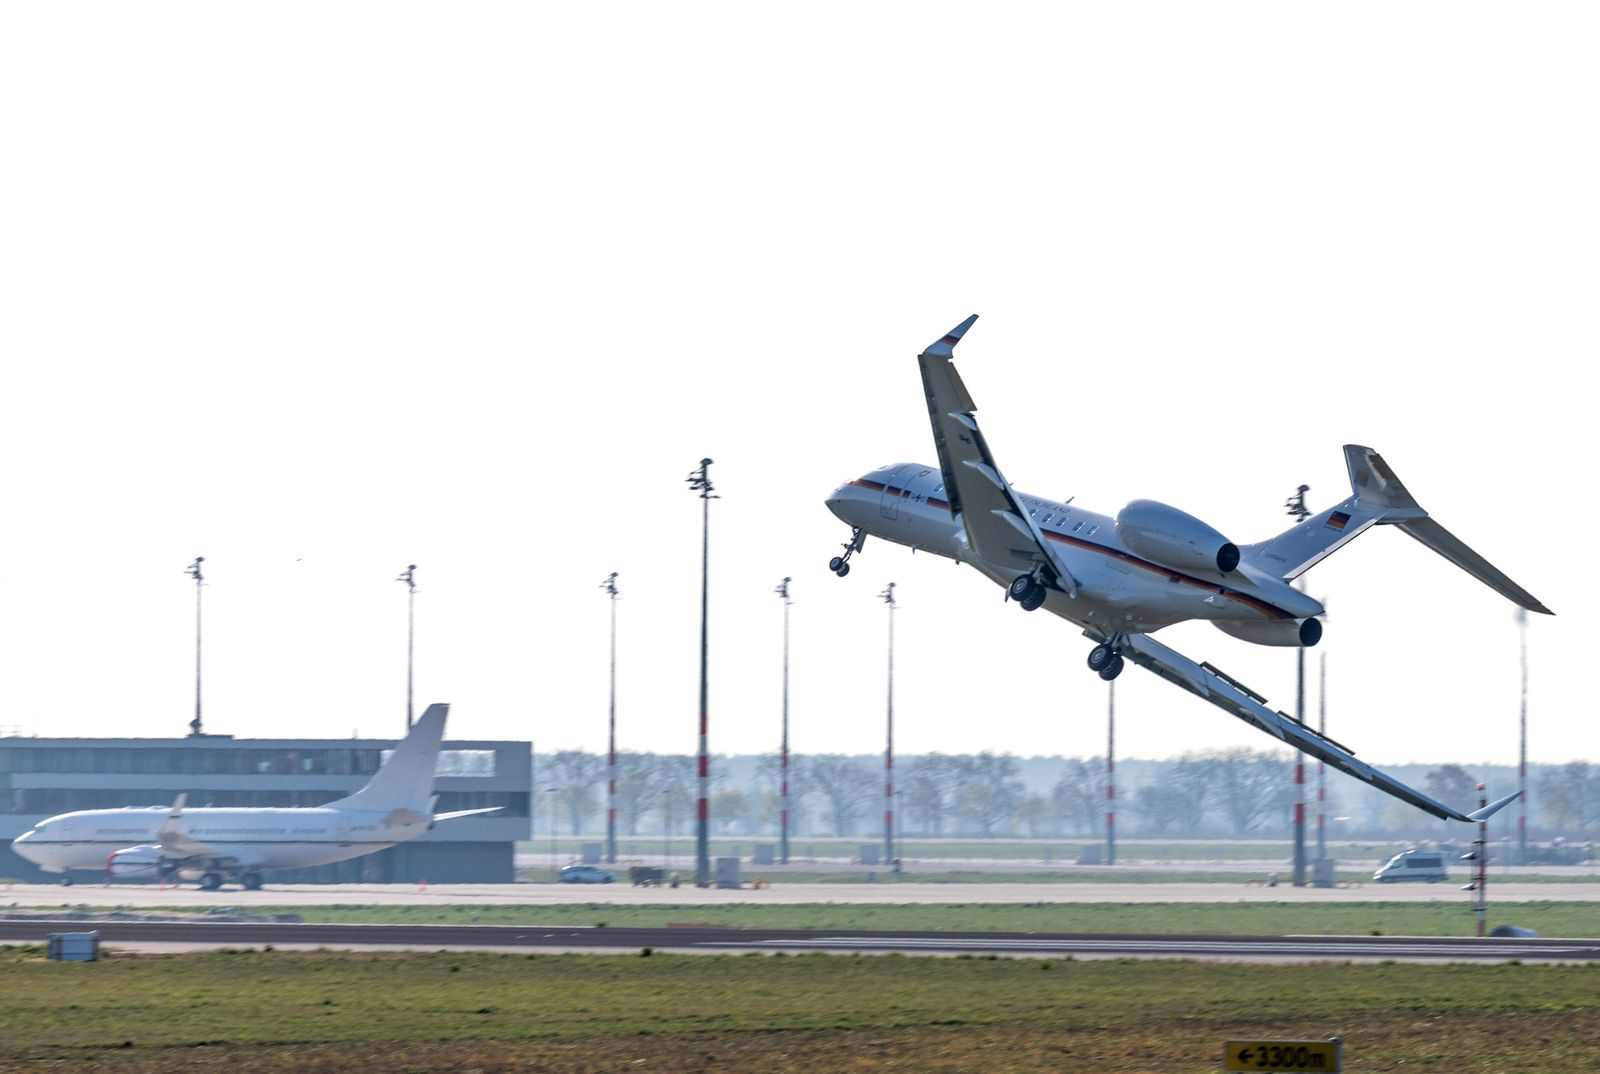 Berlin/ Notlandung/ Planespotter